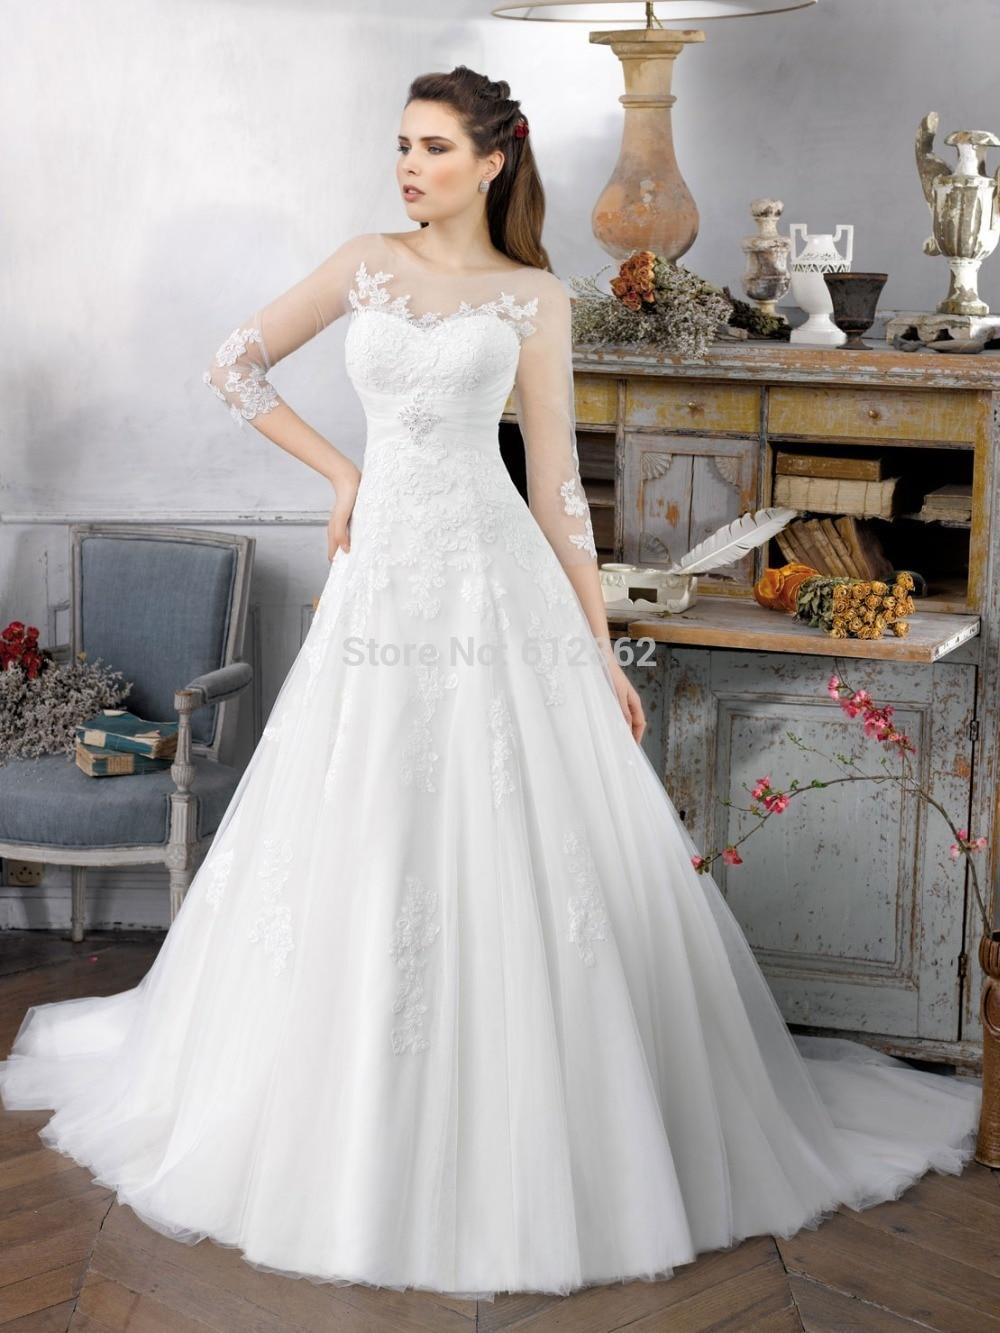 Bridal sort 20a&page 3 modest wedding dress M AB